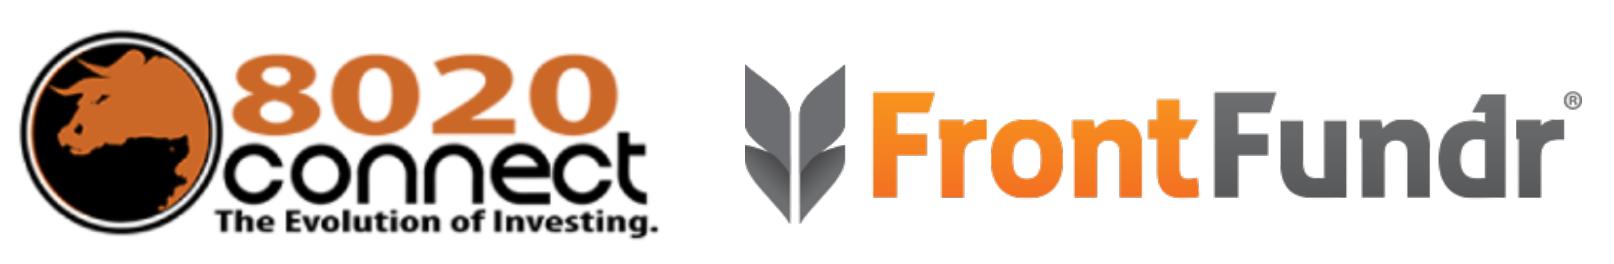 ff plus 8020 merged-1